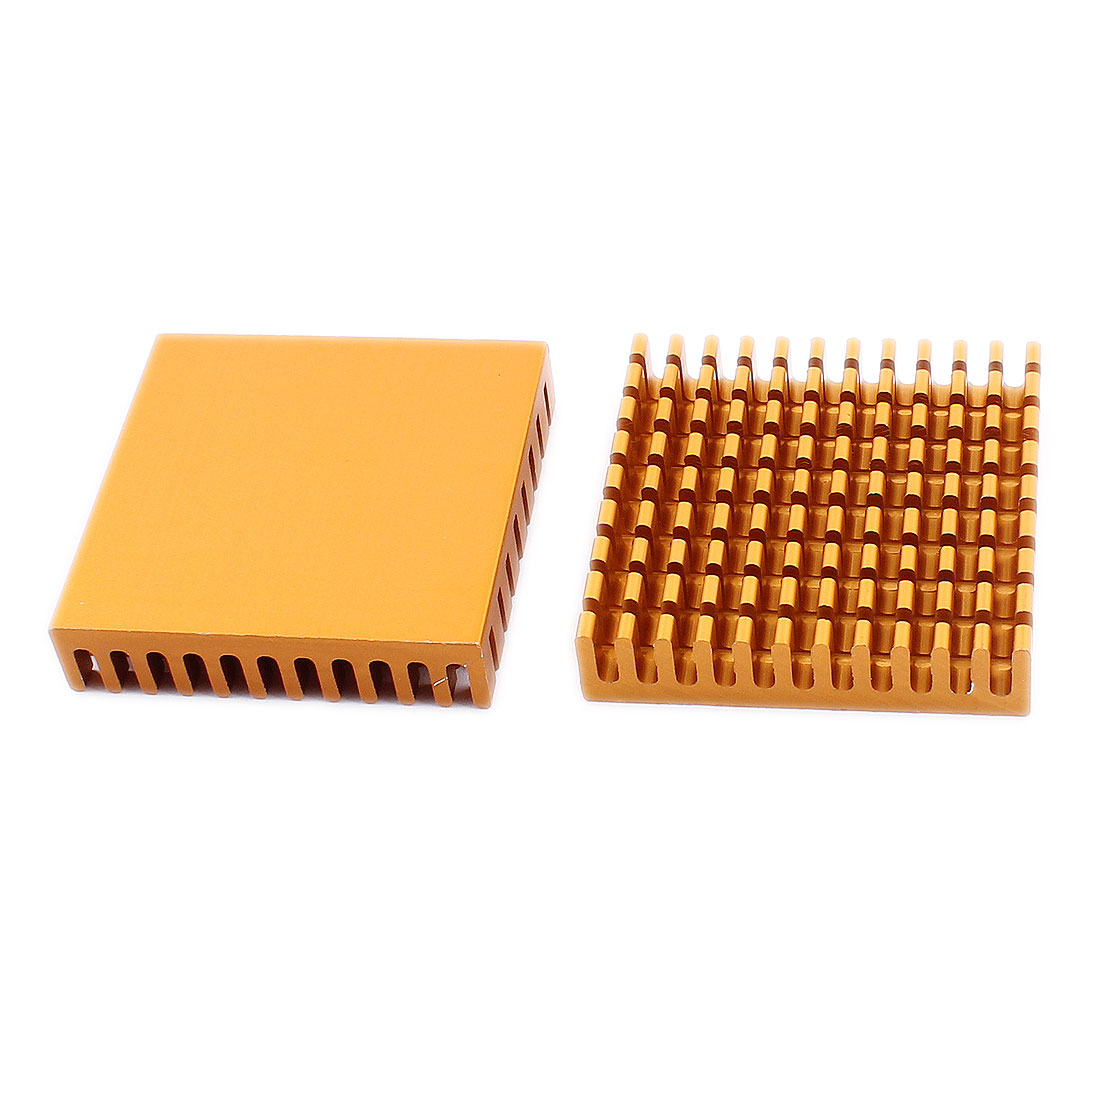 2pcs 45x45x10mm Aluminium Heat Sink Cooler Radiator Fin Heatsink Gold Tone - image 1 de 1